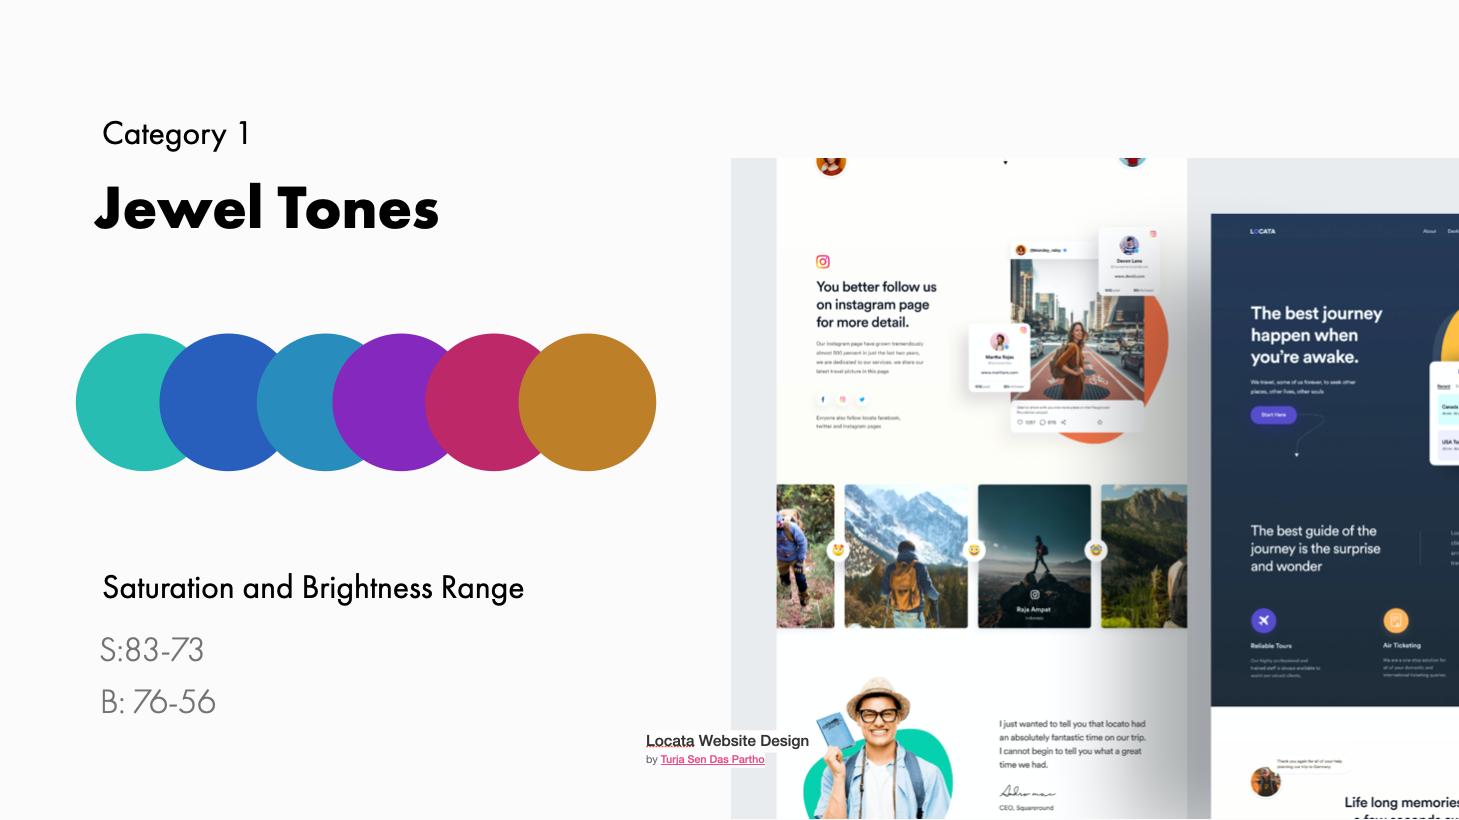 Jewel Tone examples and range | Locata Website Design by Turja Sen Das Partho